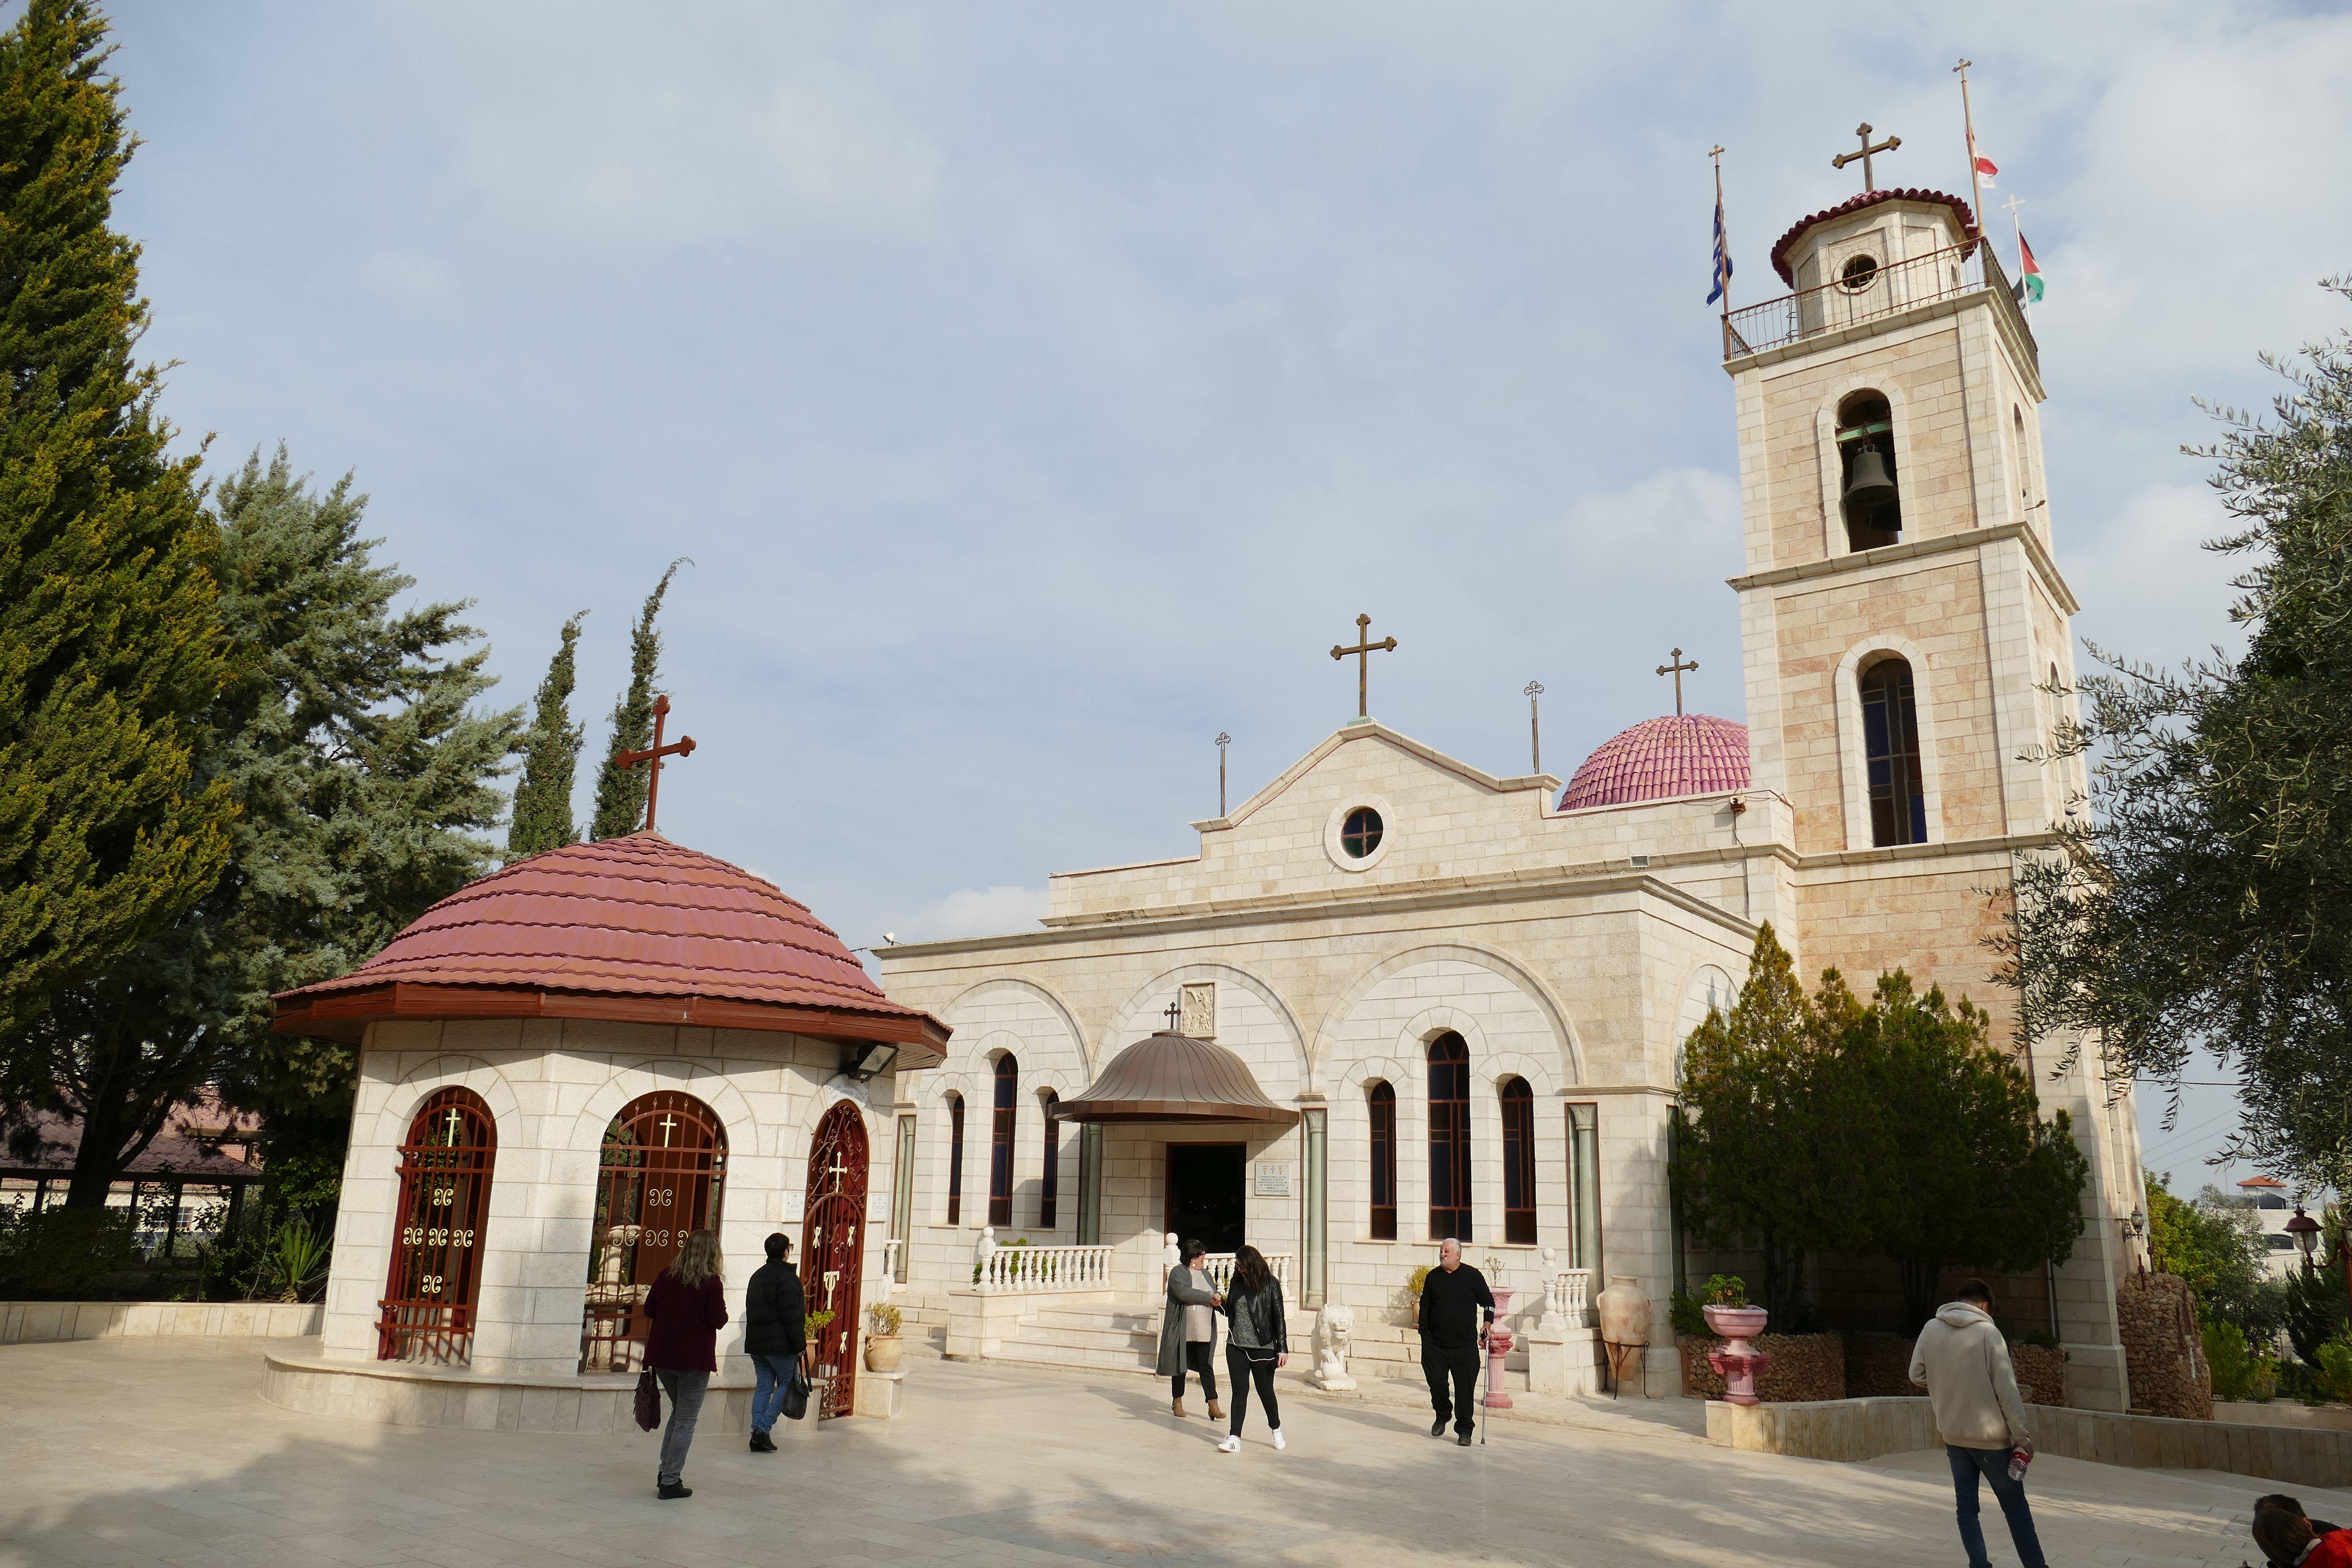 Бейт Сахур - Поле пастушков (православное).